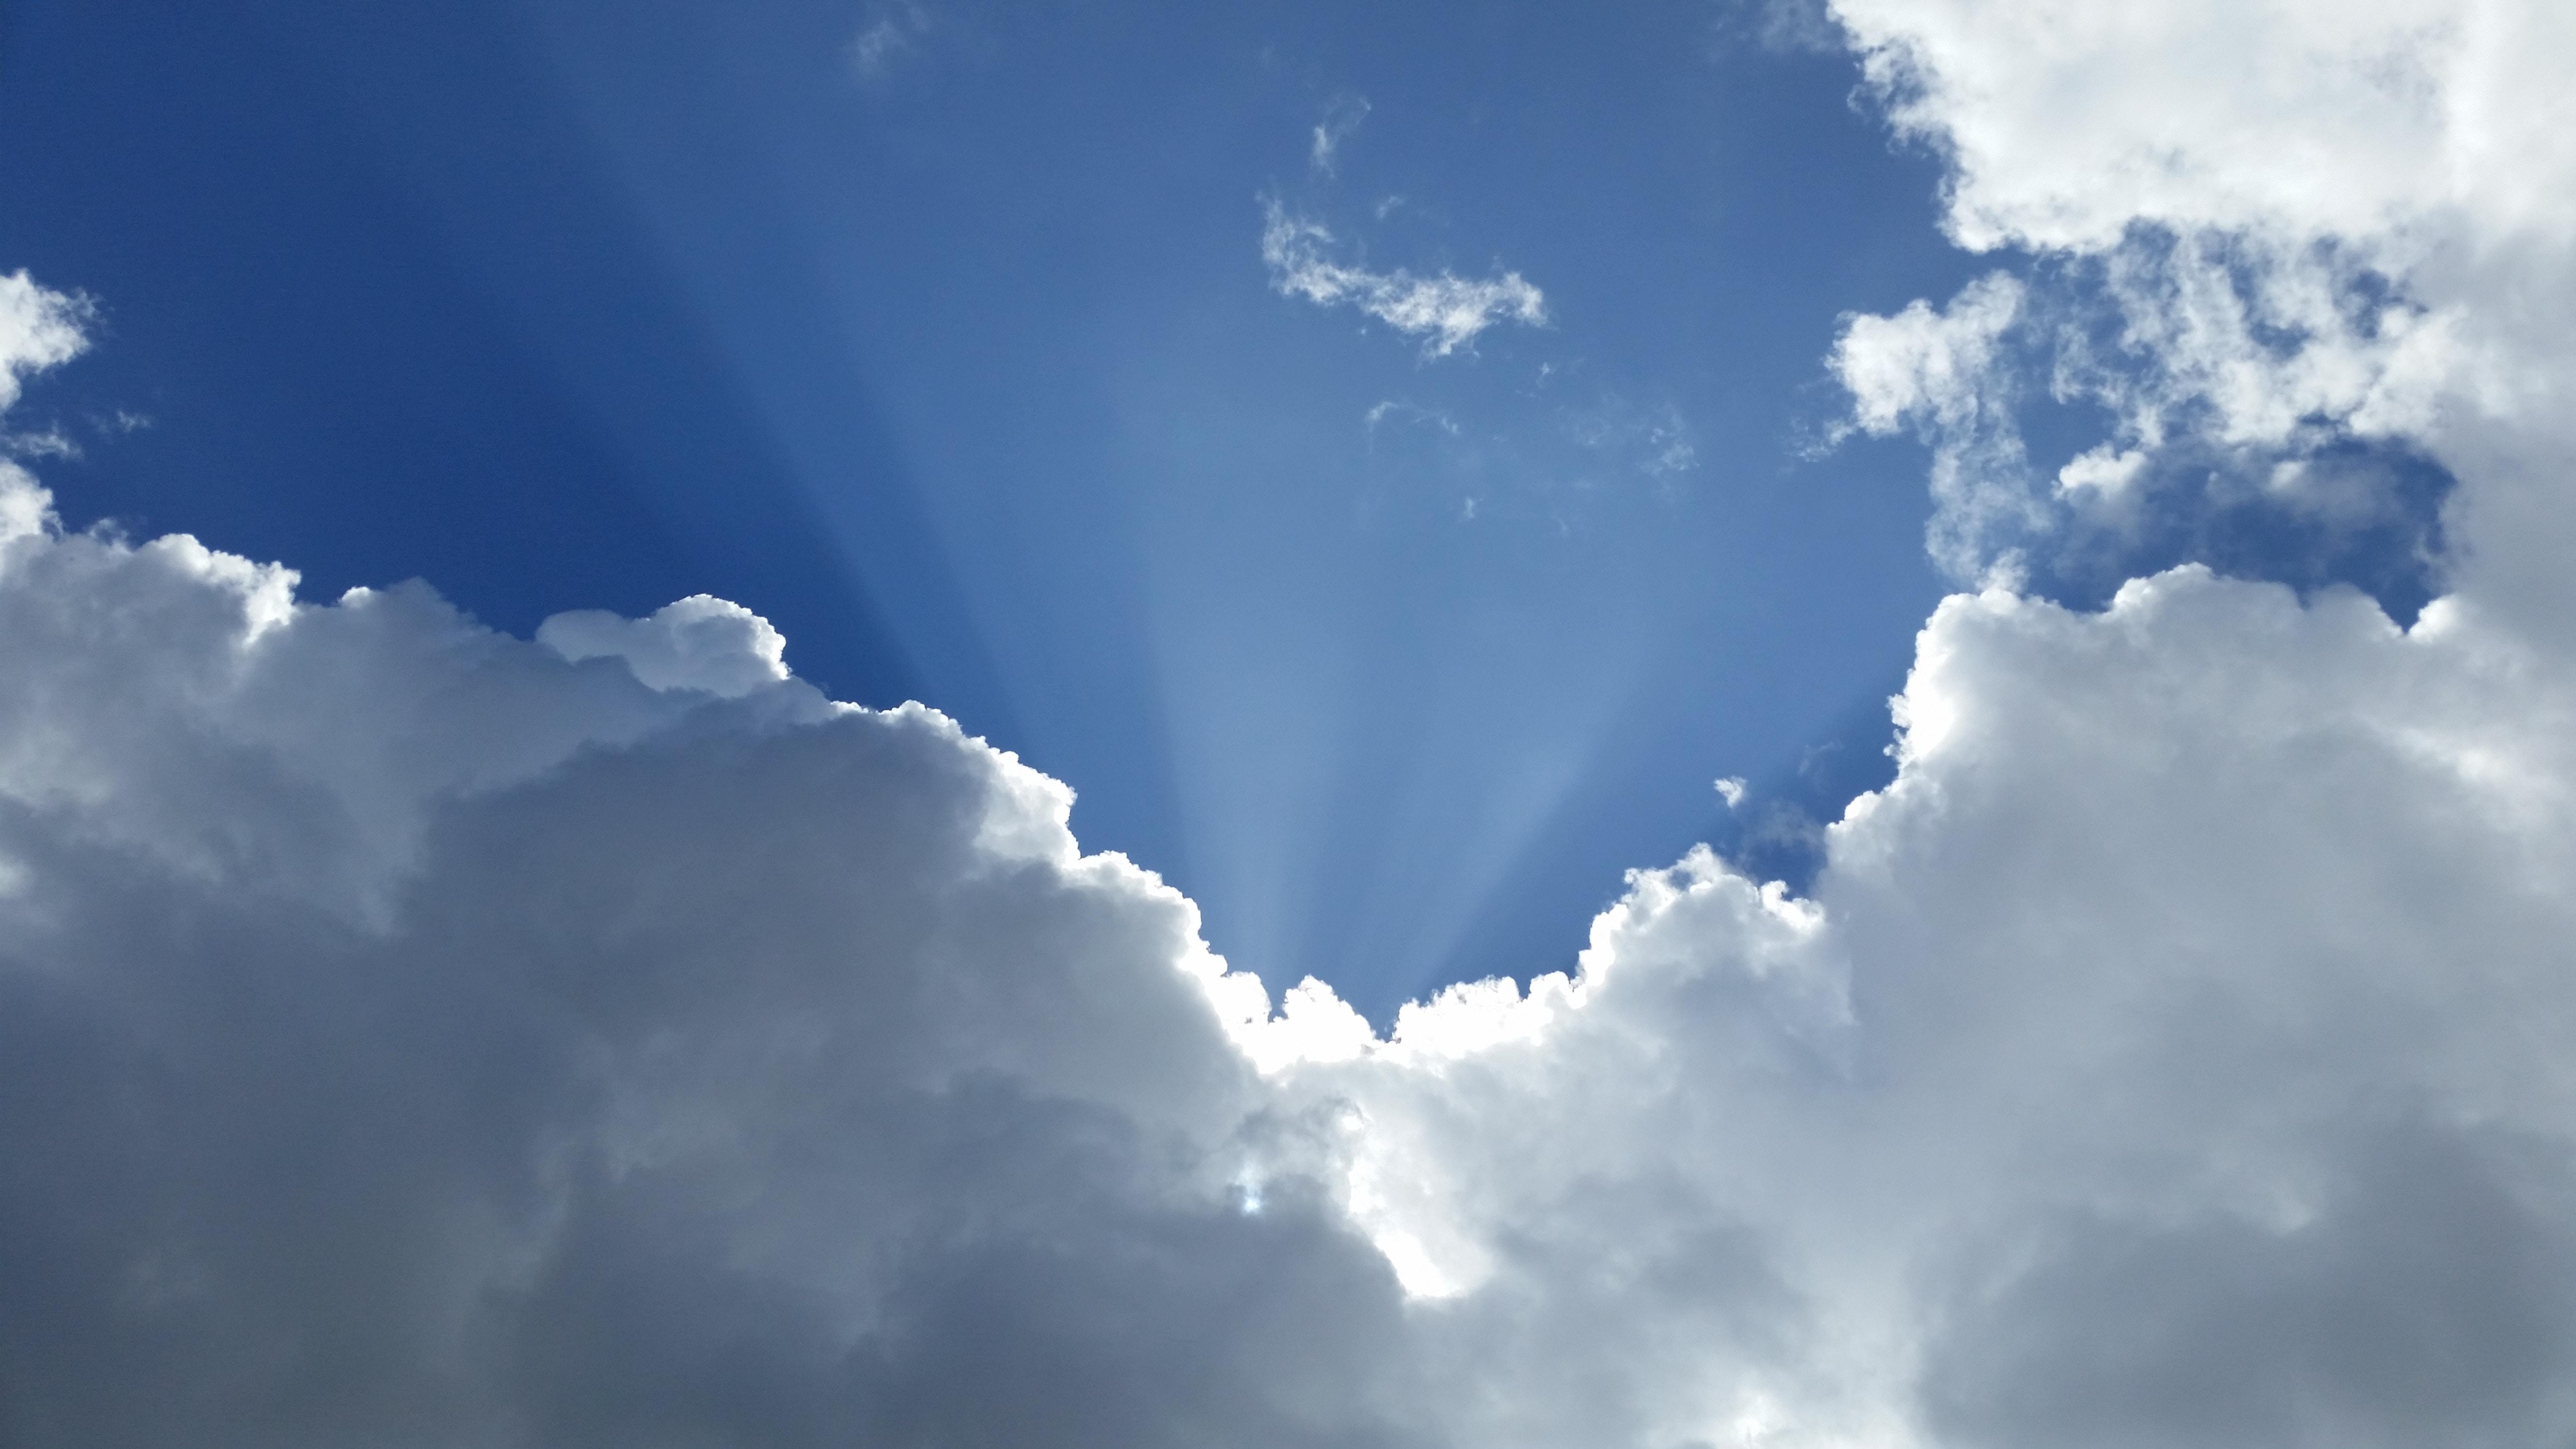 Blue Sky and Clouds Paul Csogi